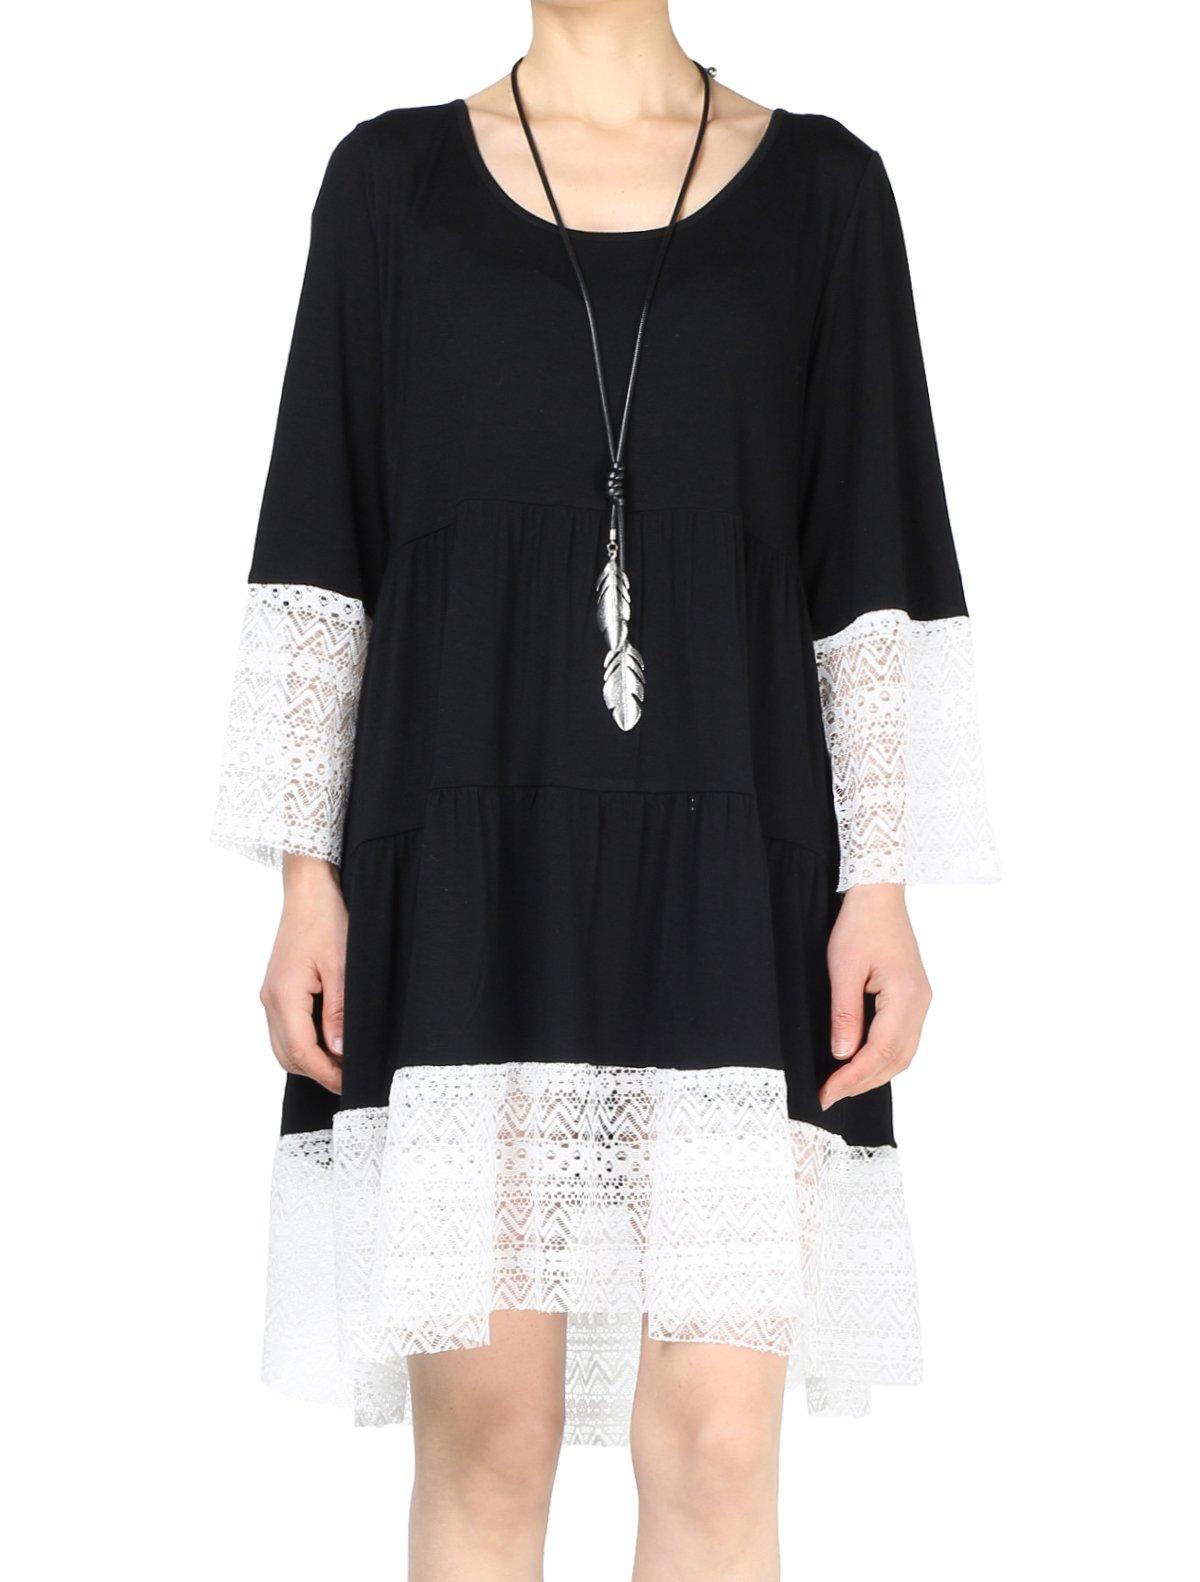 Mordenmiss Women's Flared Tunics Dress Lace Trim Boho Shirts Side Pockets XL Black